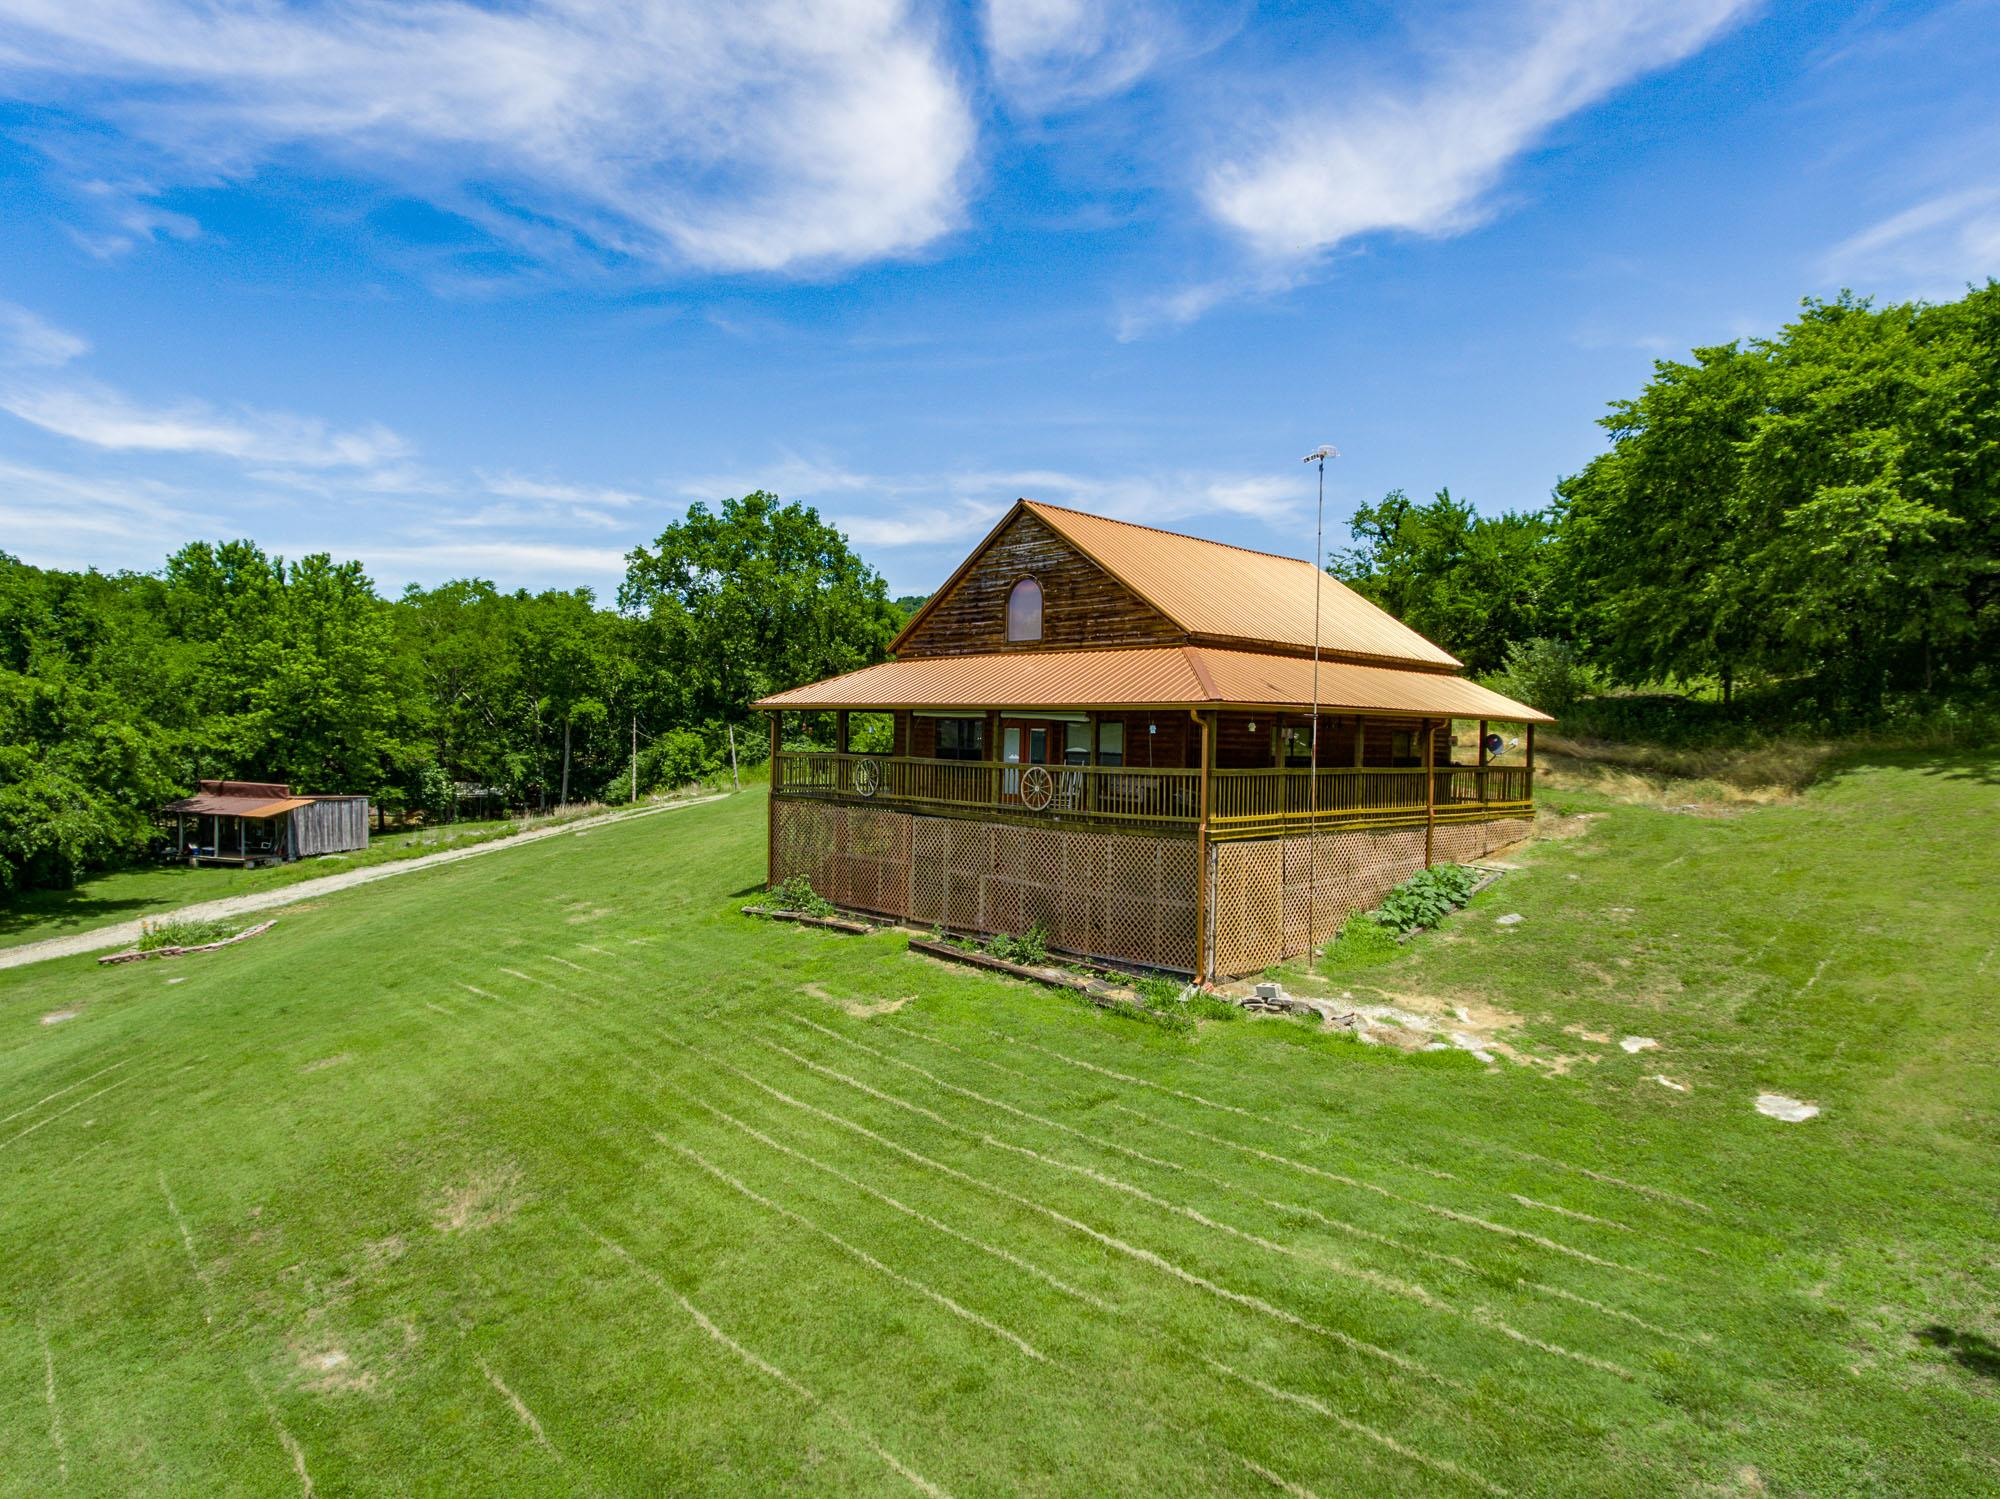 672 Holleman Bend Ln, Granville, TN 38564 - Granville, TN real estate listing